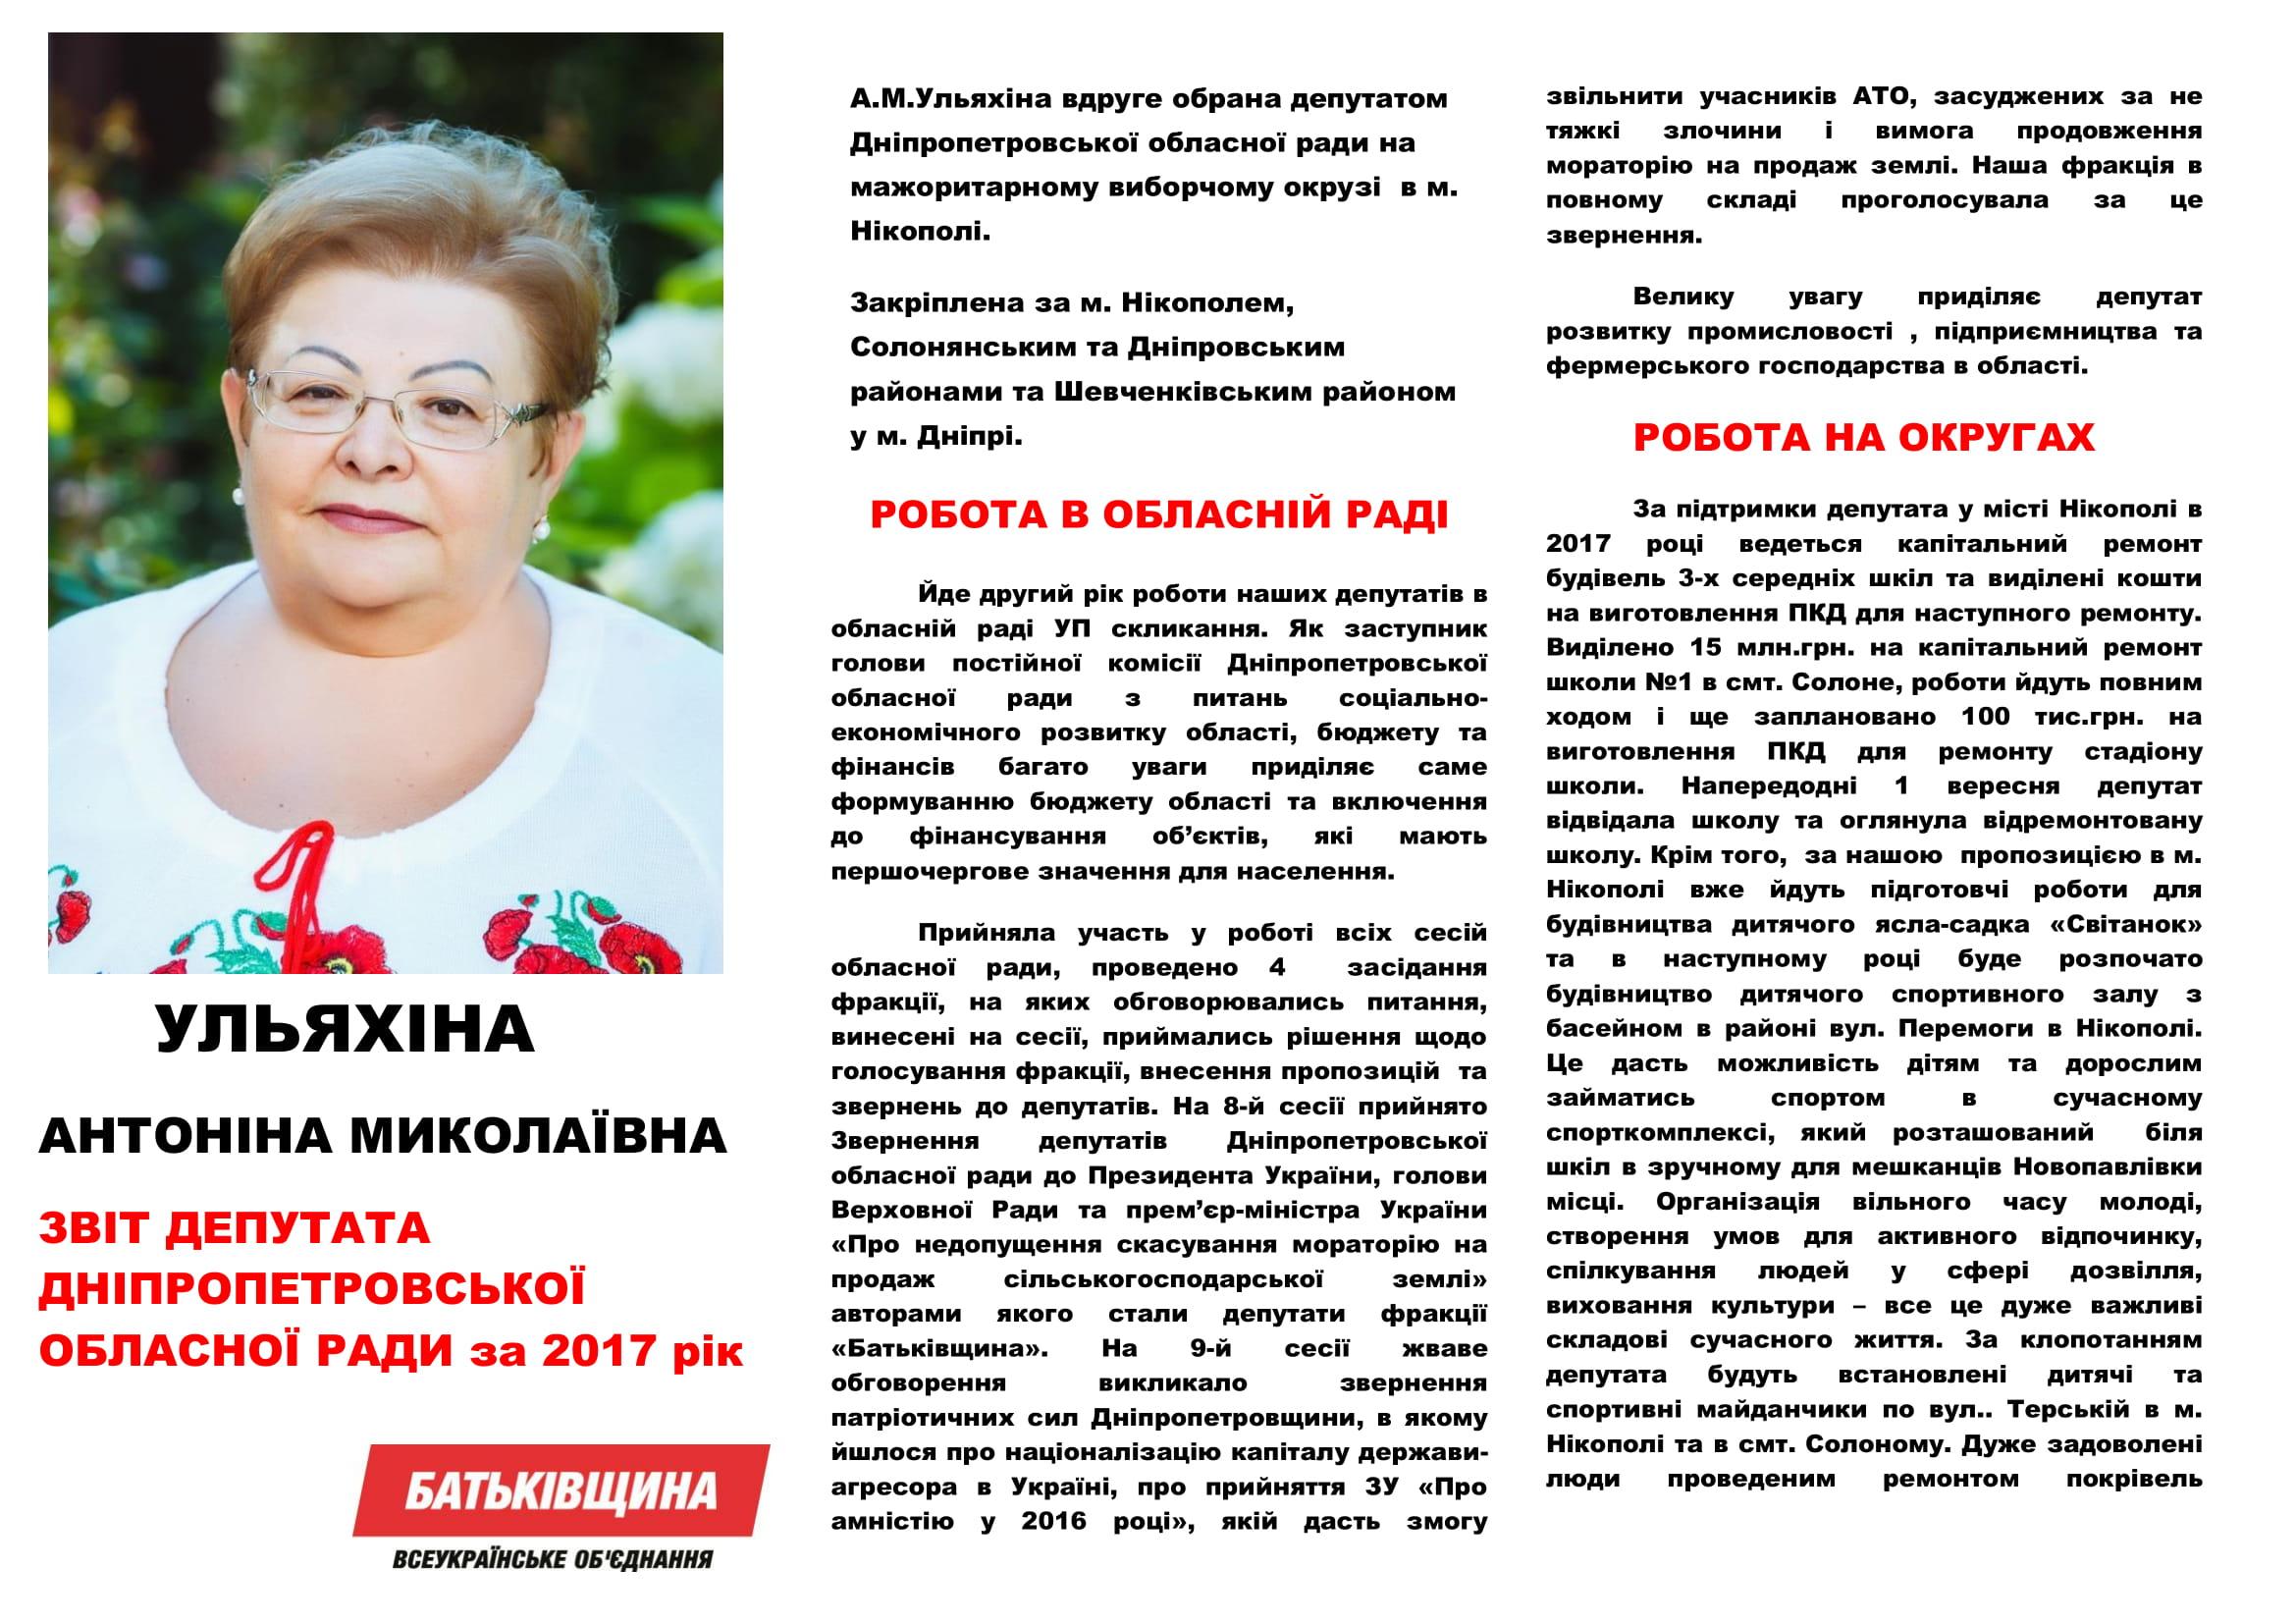 звіт-Ульяхіної-А.Н.-1-1